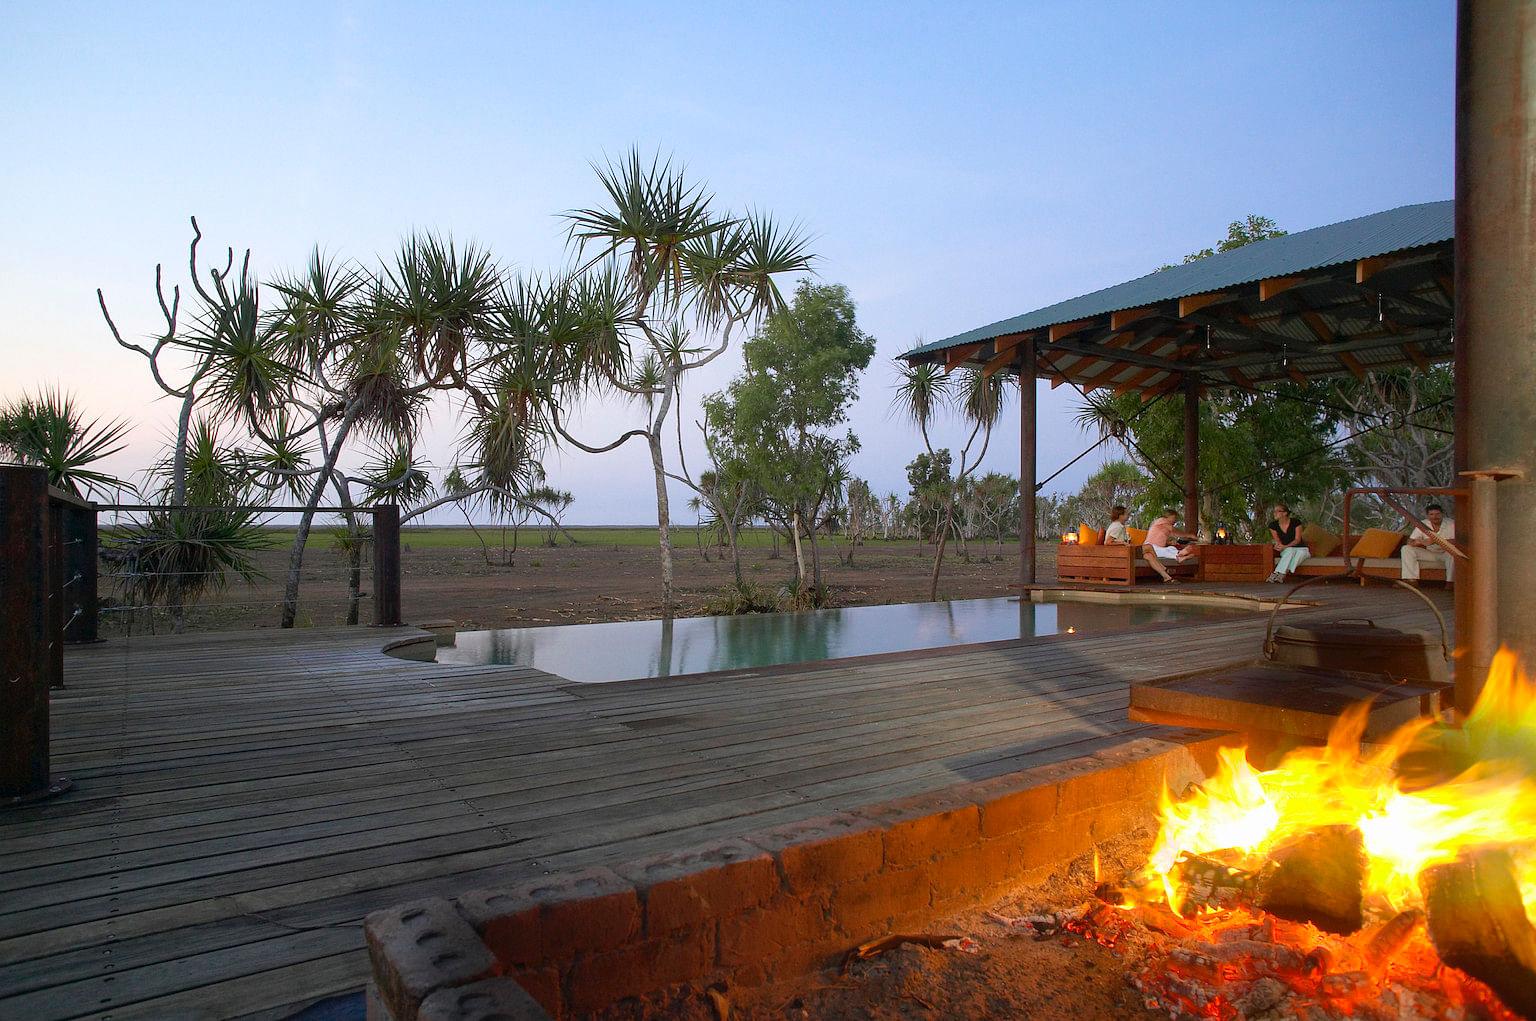 Bamurru Plains Kakadu National Park